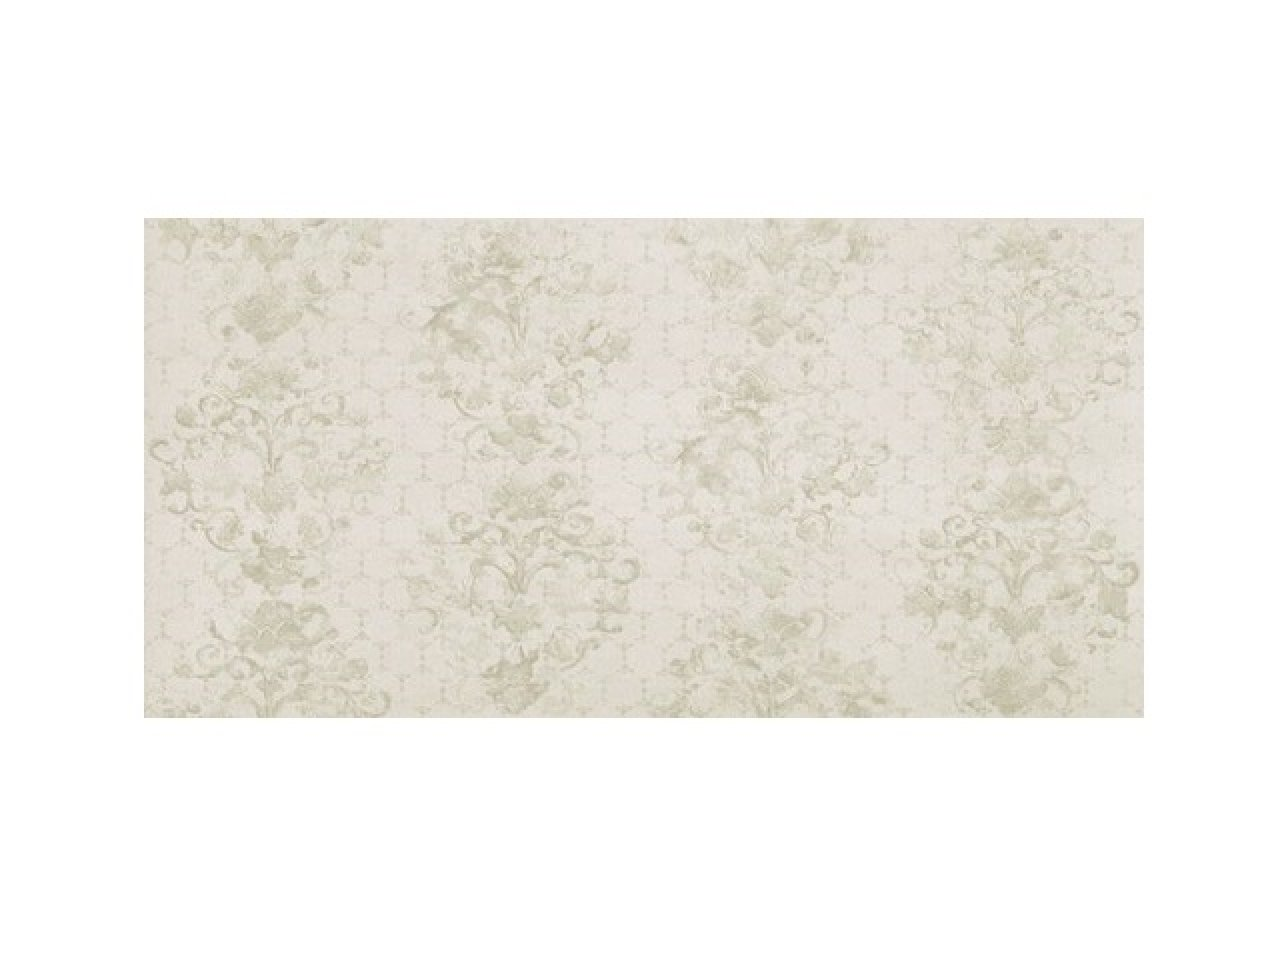 Настенная плитка Arty Milk Textile 40x80